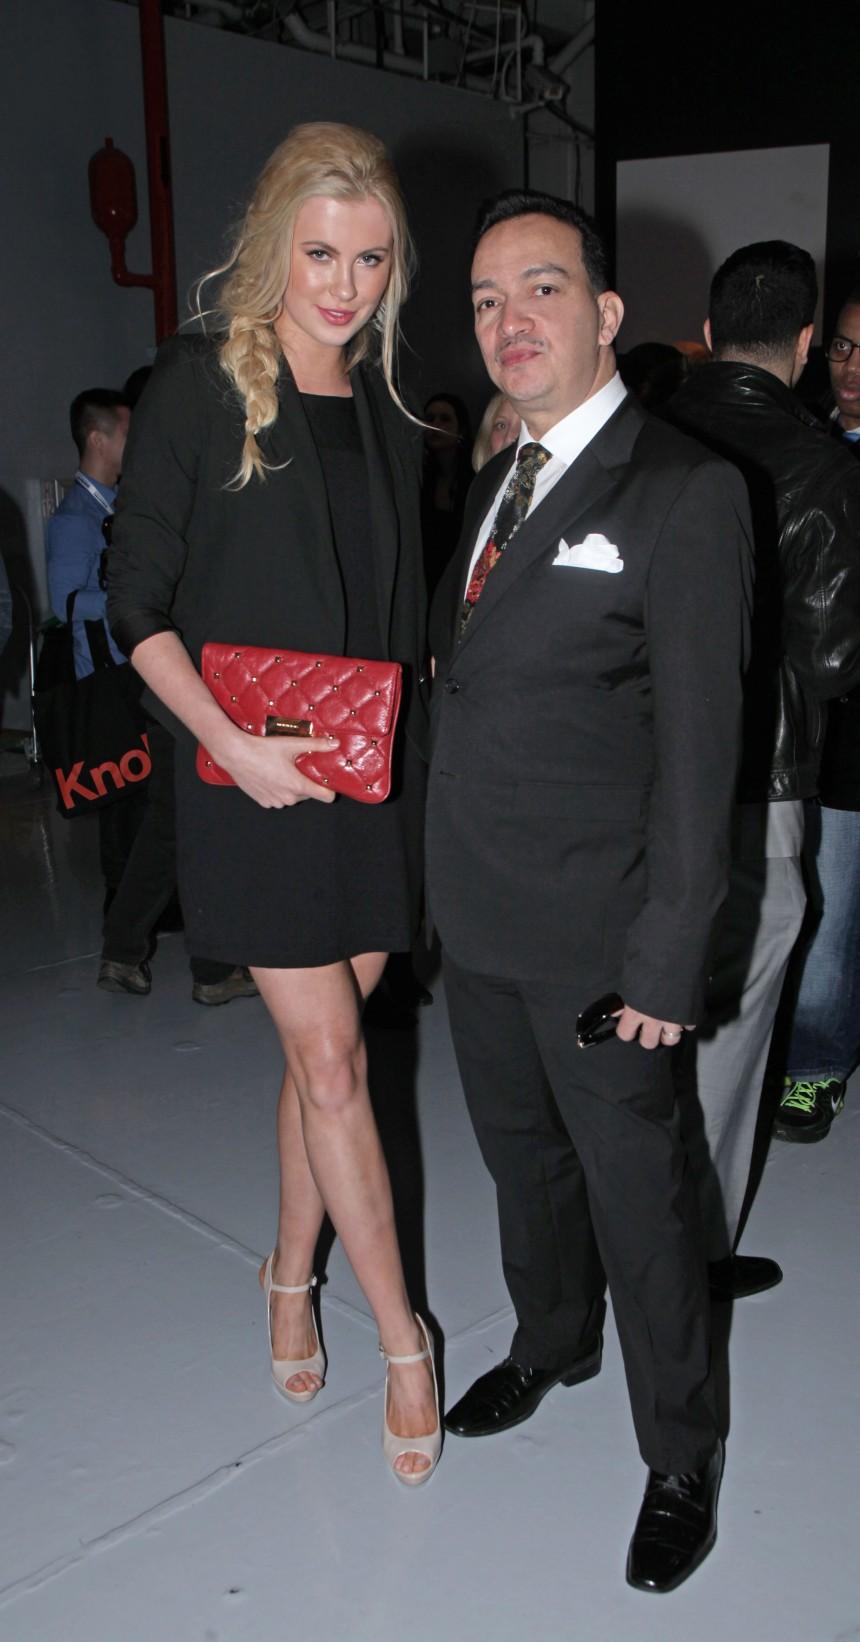 Anthony Rubio and Ireland Baldwin at Jeffrey Fashion Cares 10th Anniversary Celebration